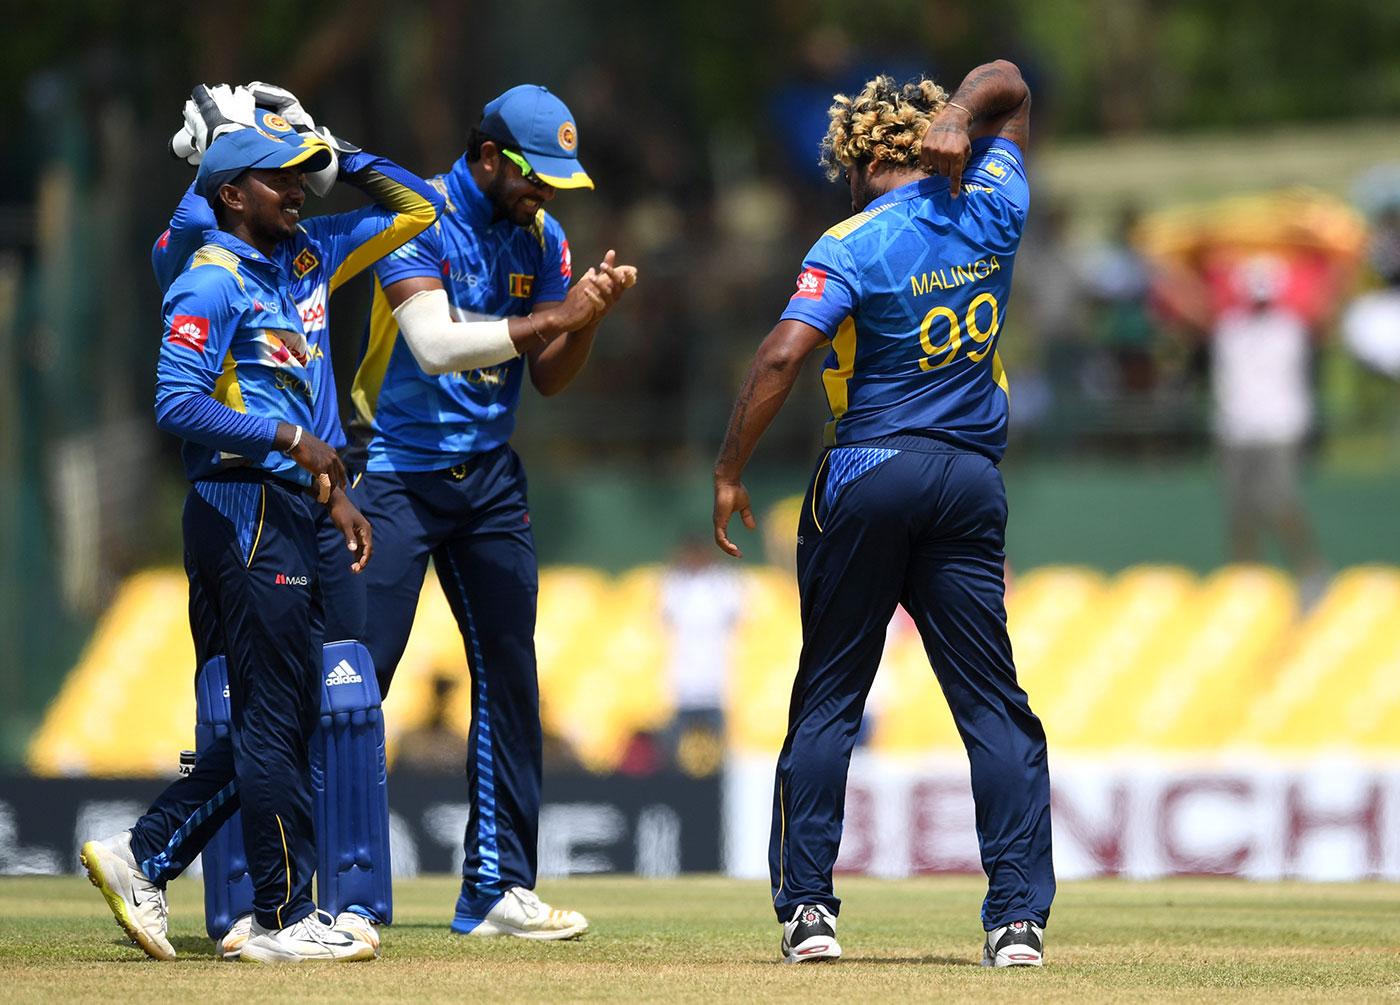 Sri Lanka vs England 2nd ODI Highlights